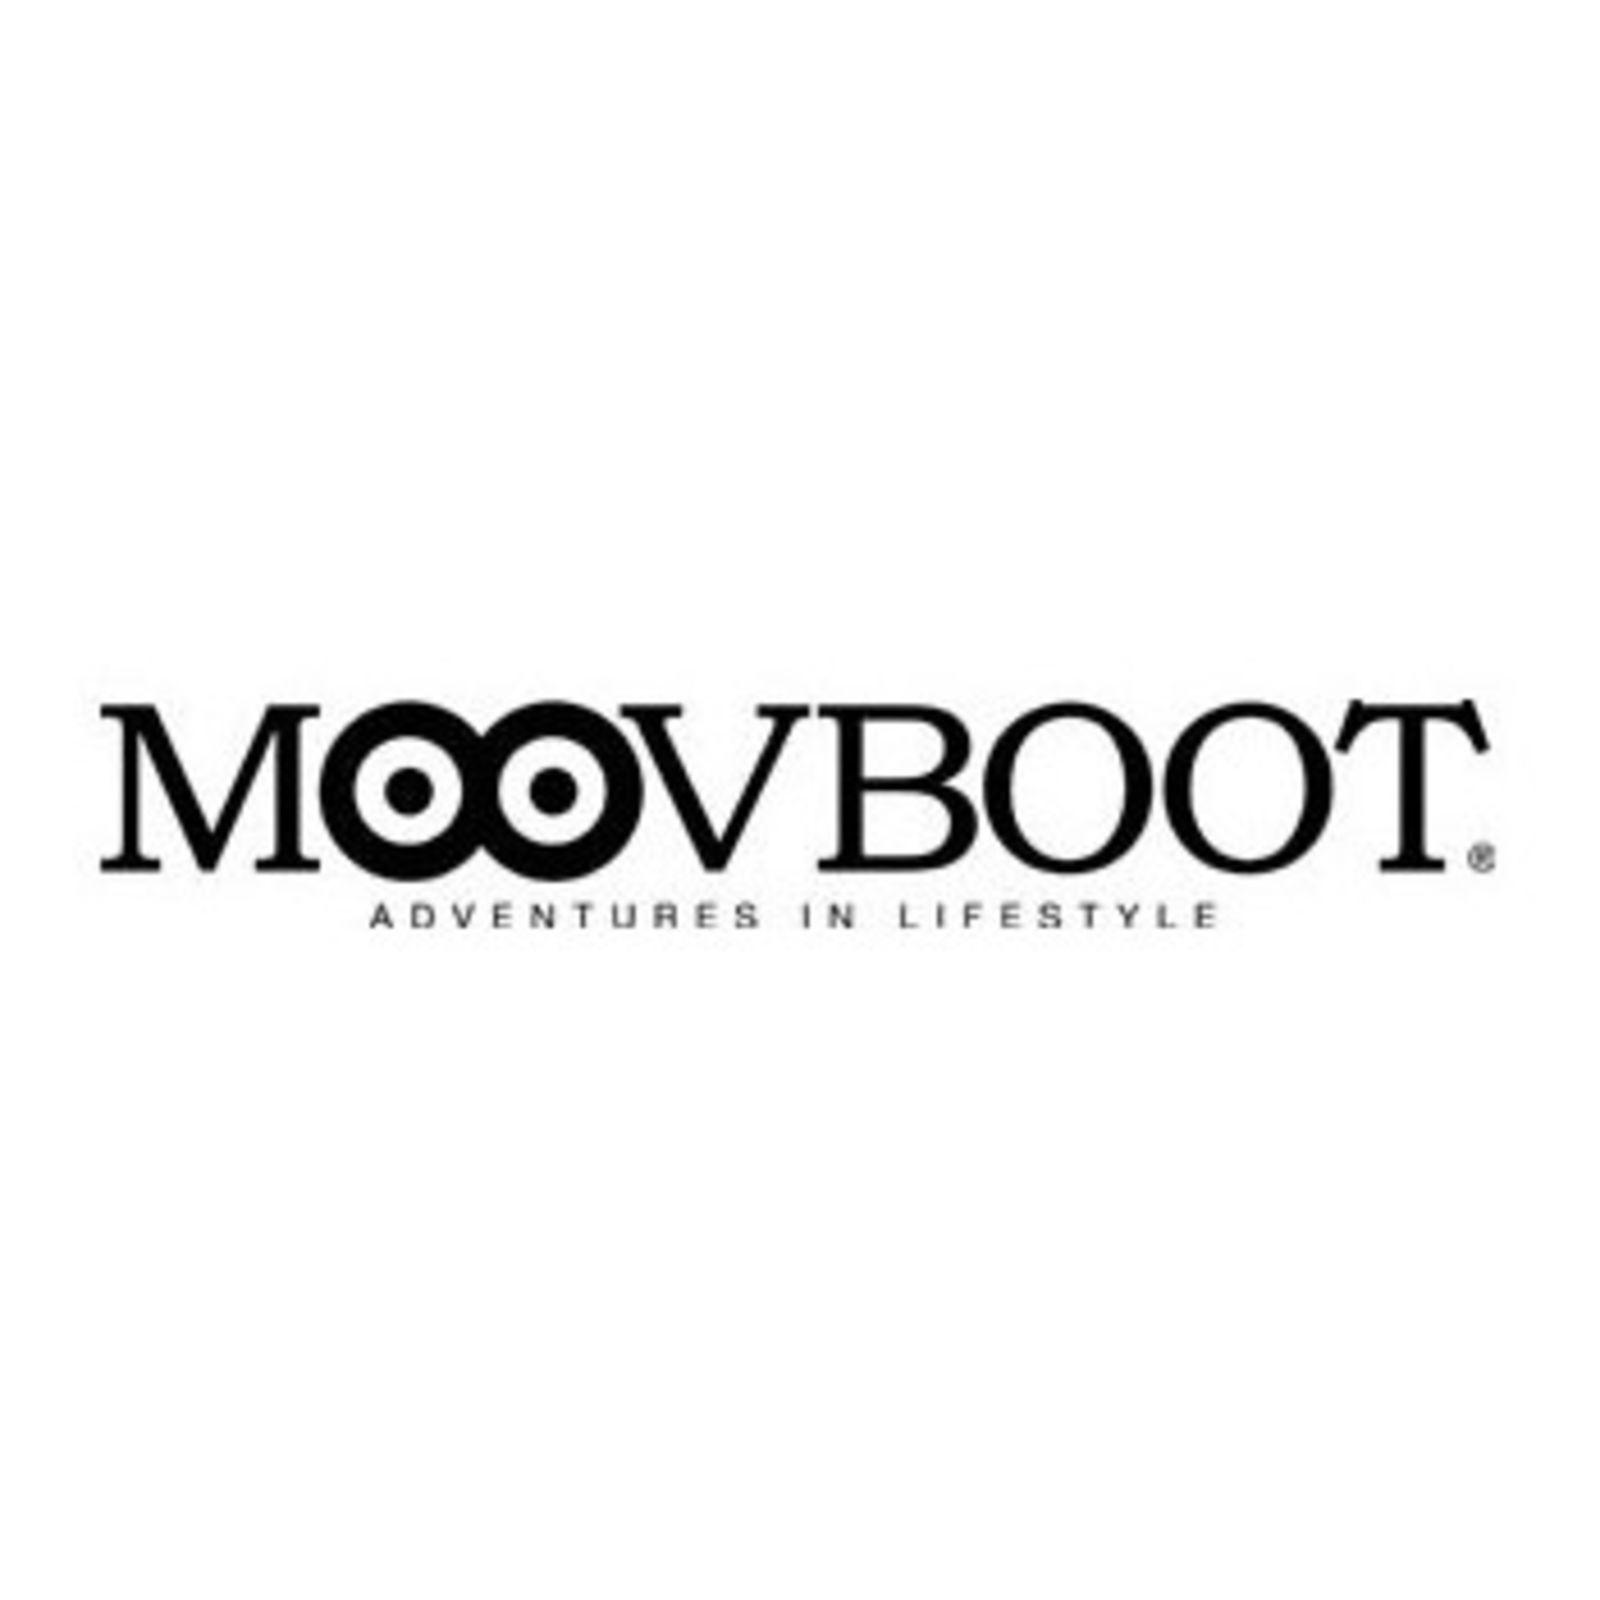 MOOVBOOT